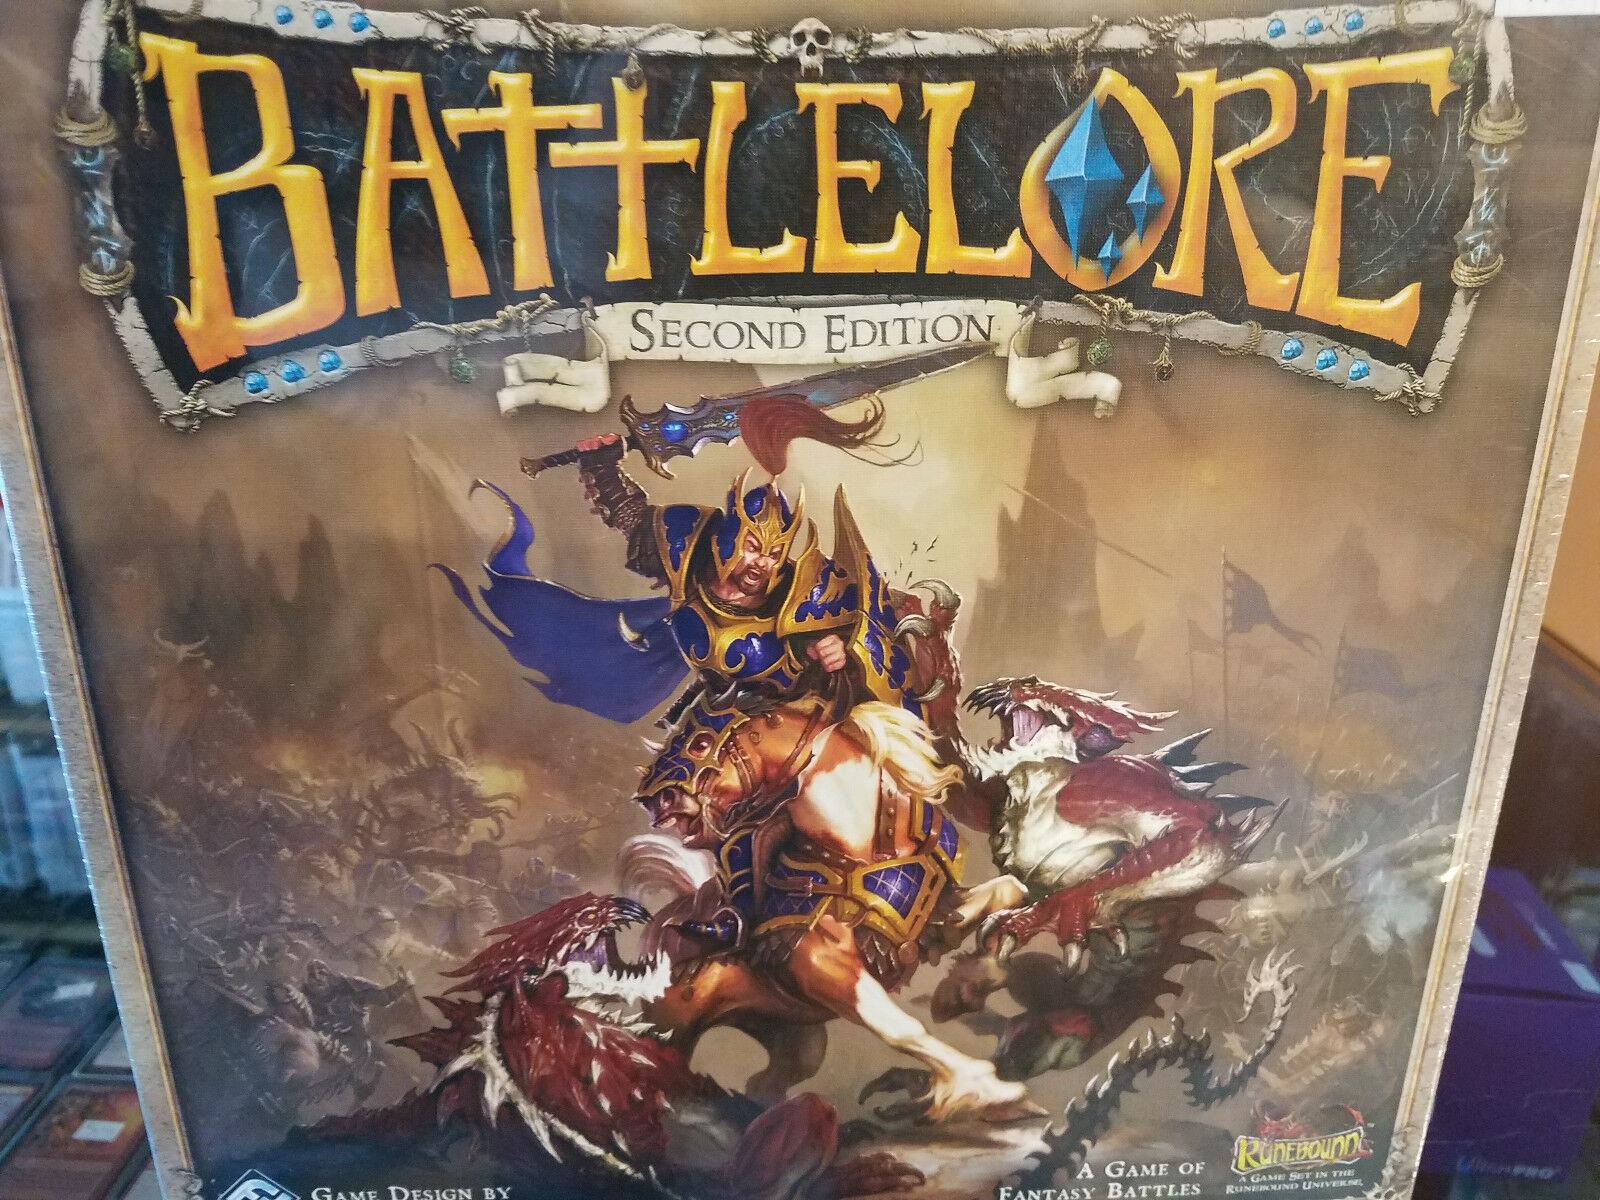 Battlelore 2nd Second Edition Edition Edition - FFG Games - Board Game New / NIB 1f6725